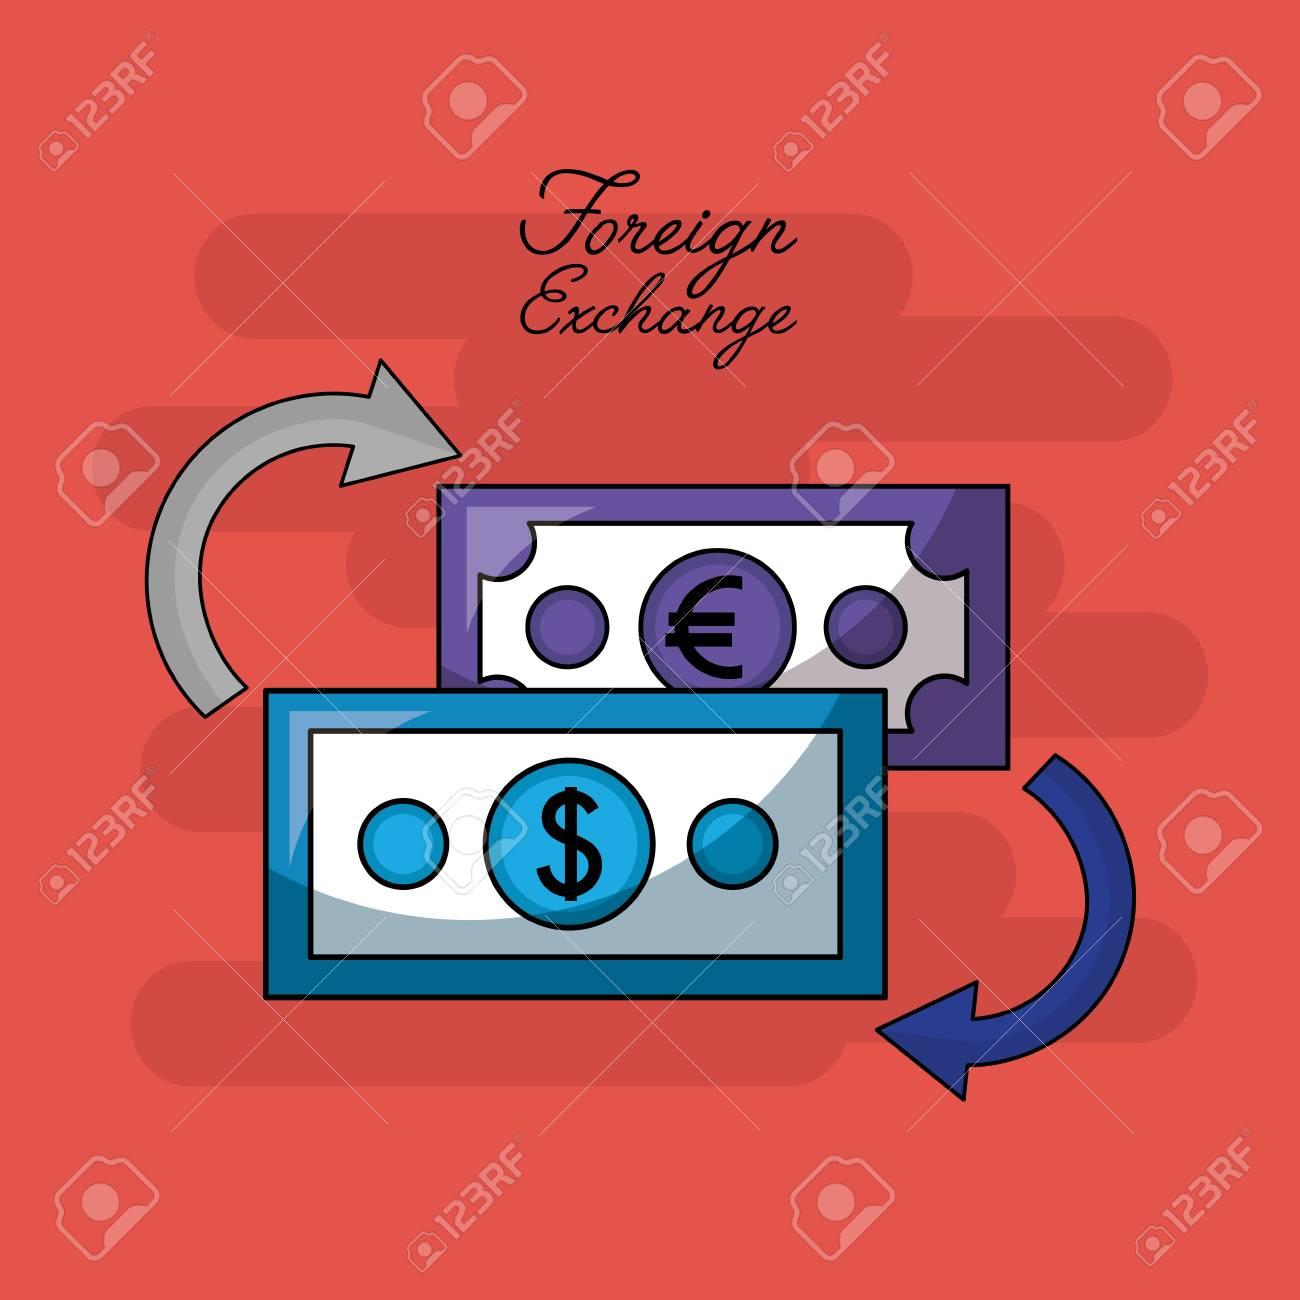 foreign exchange money euro dollar retro style background vector illustration - 111861427